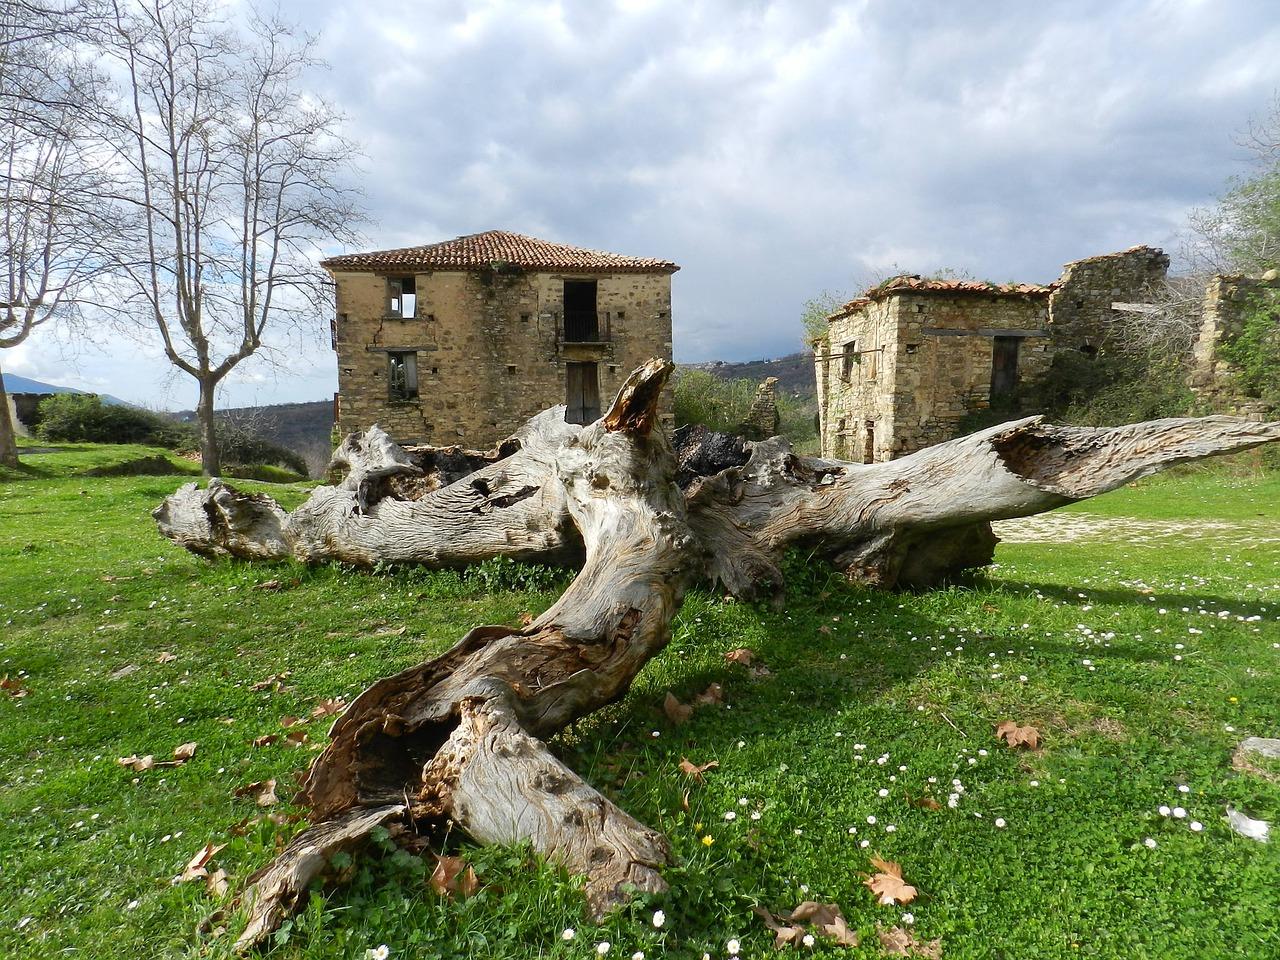 Roscigno Vecchia - Pesi fantasma in Italia